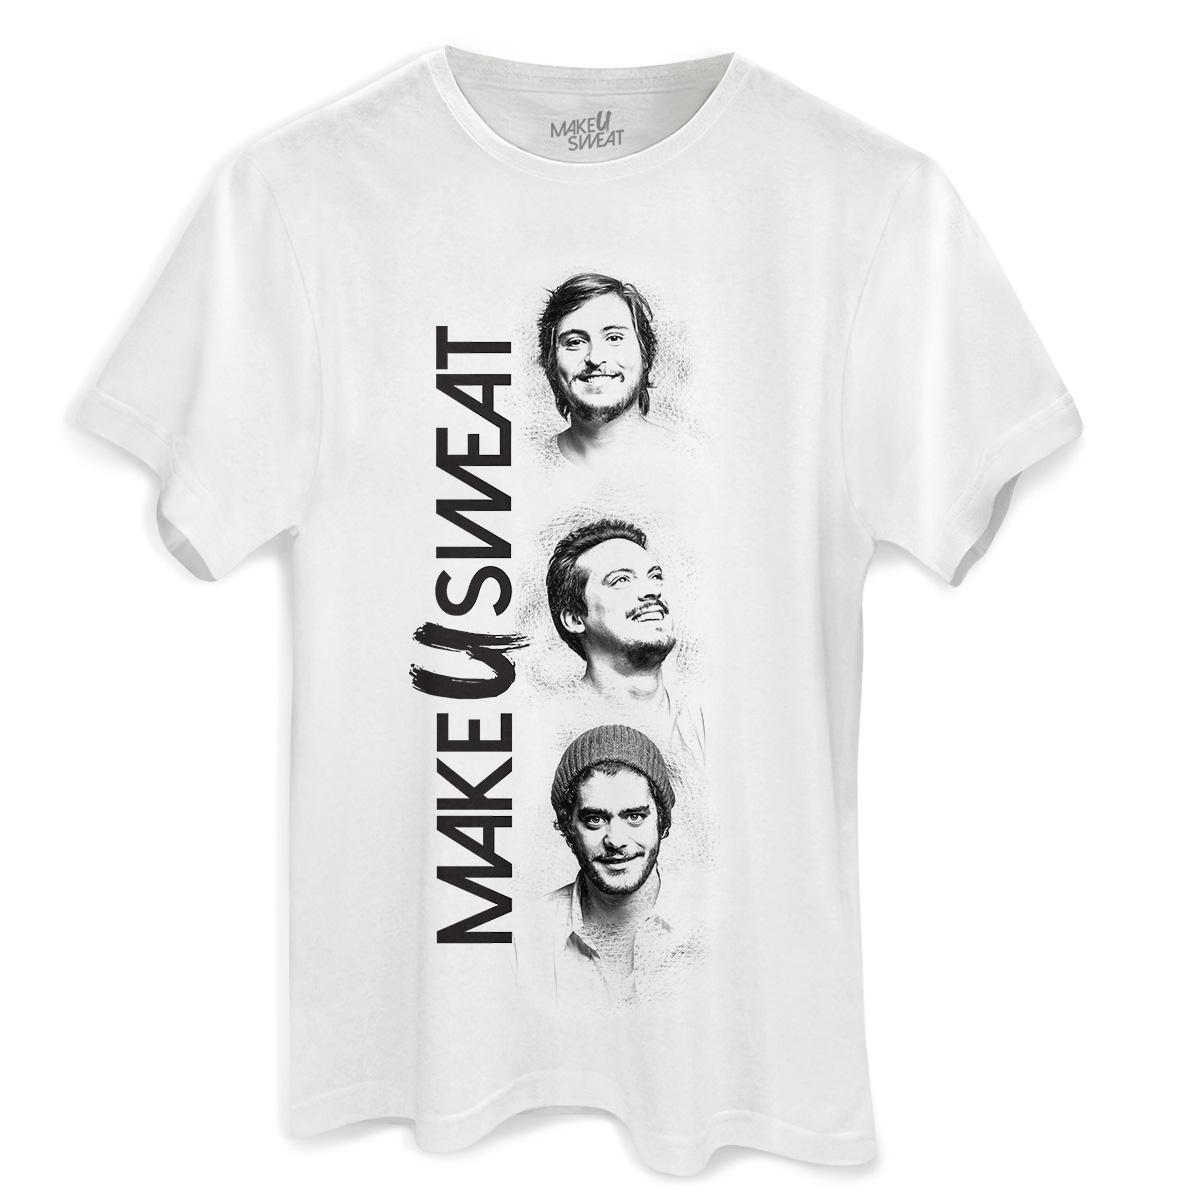 Camiseta Masculina Make U Sweat Trio